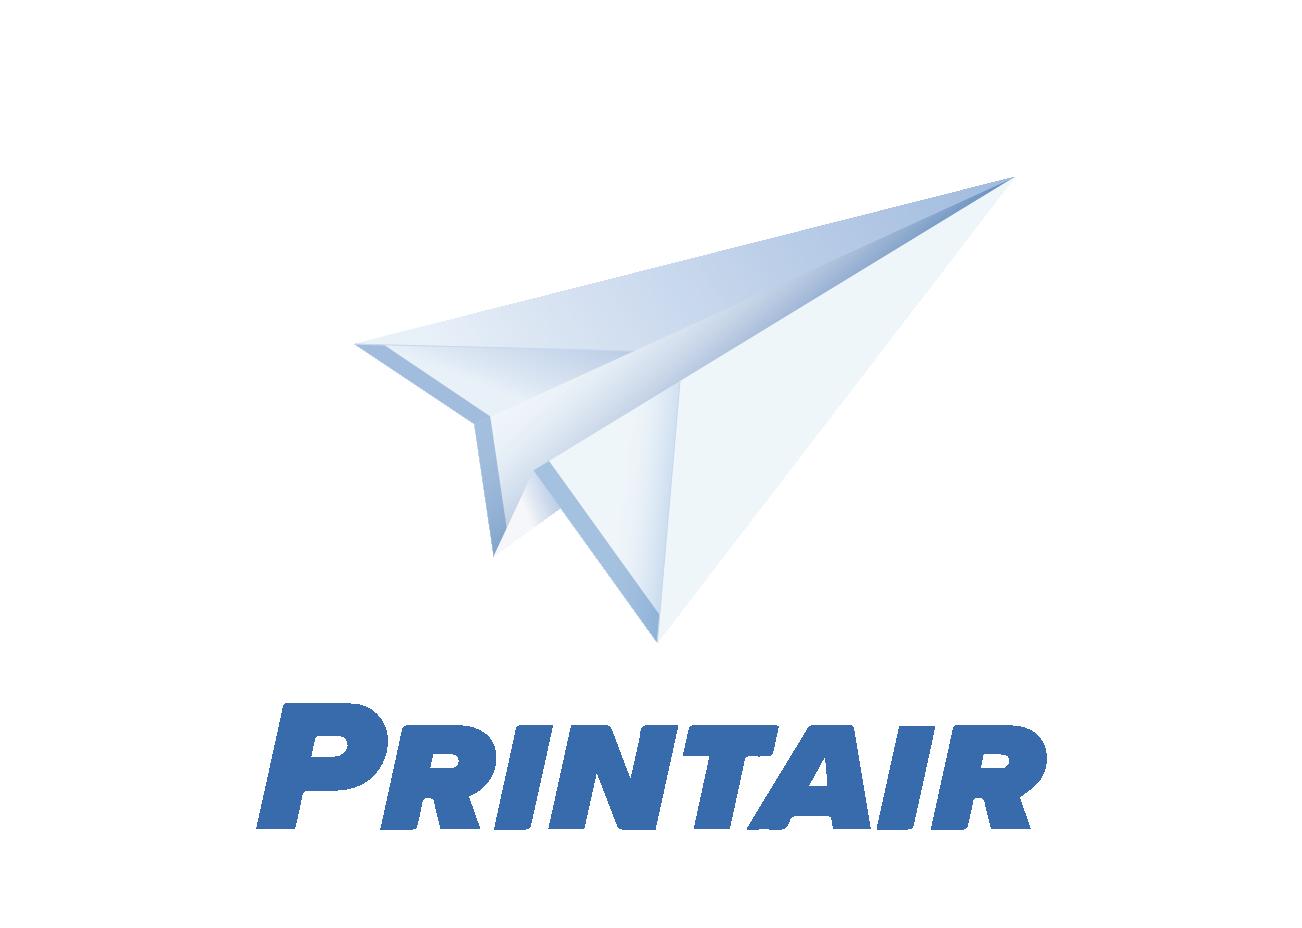 Printair